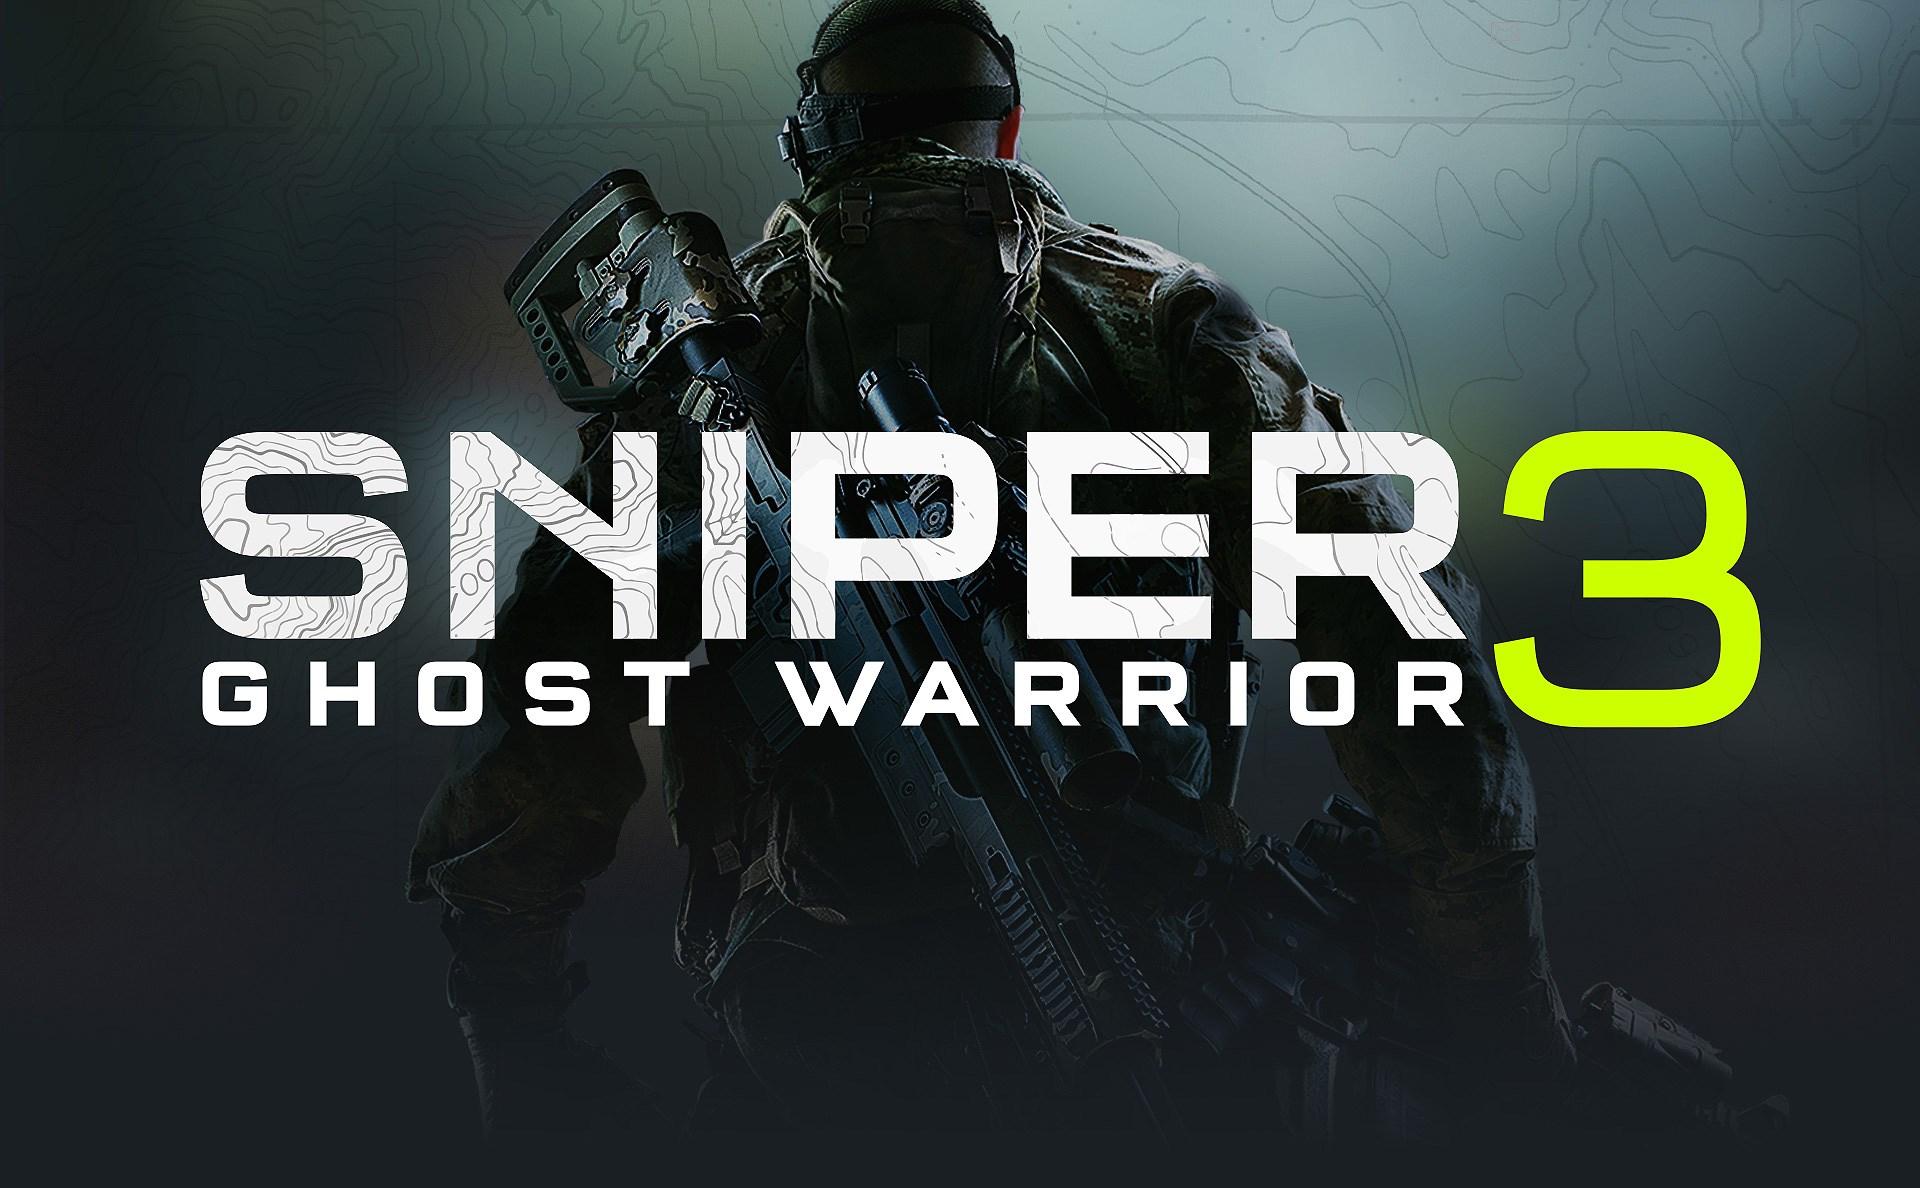 Sniper Ghost Warrior 3 Hd , HD Wallpaper & Backgrounds